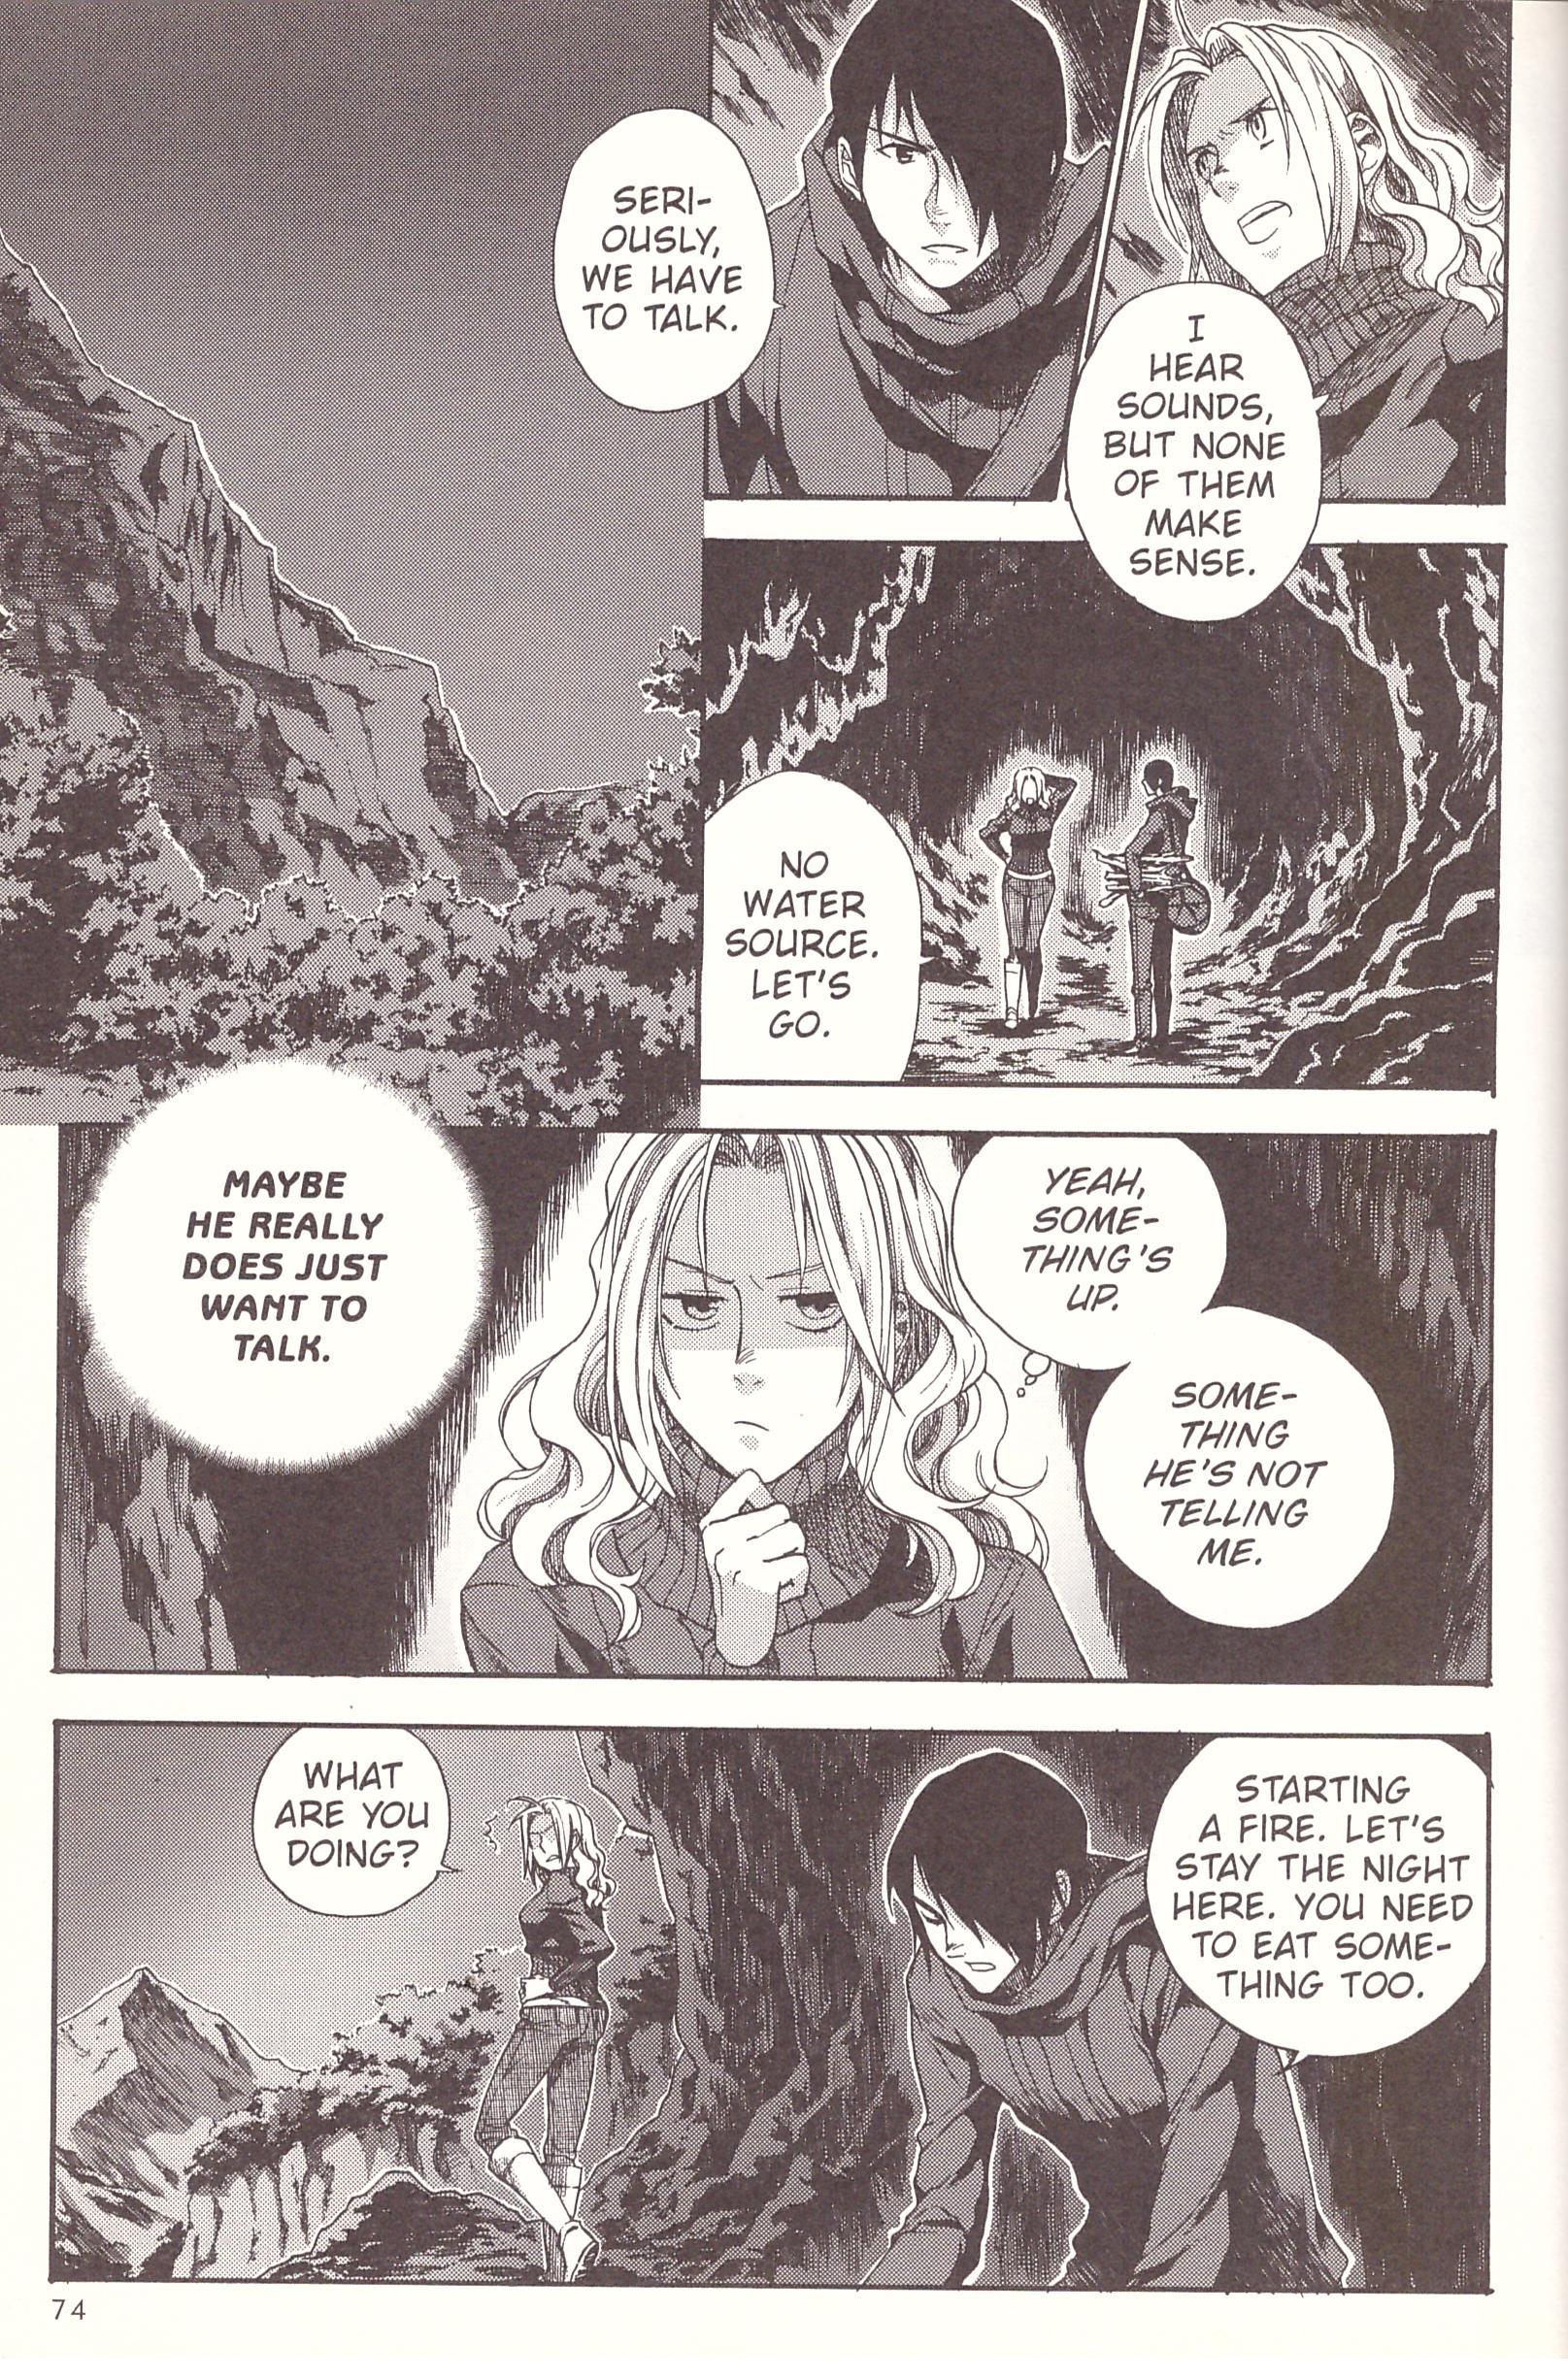 Maximum Ride 5 graphic novel review